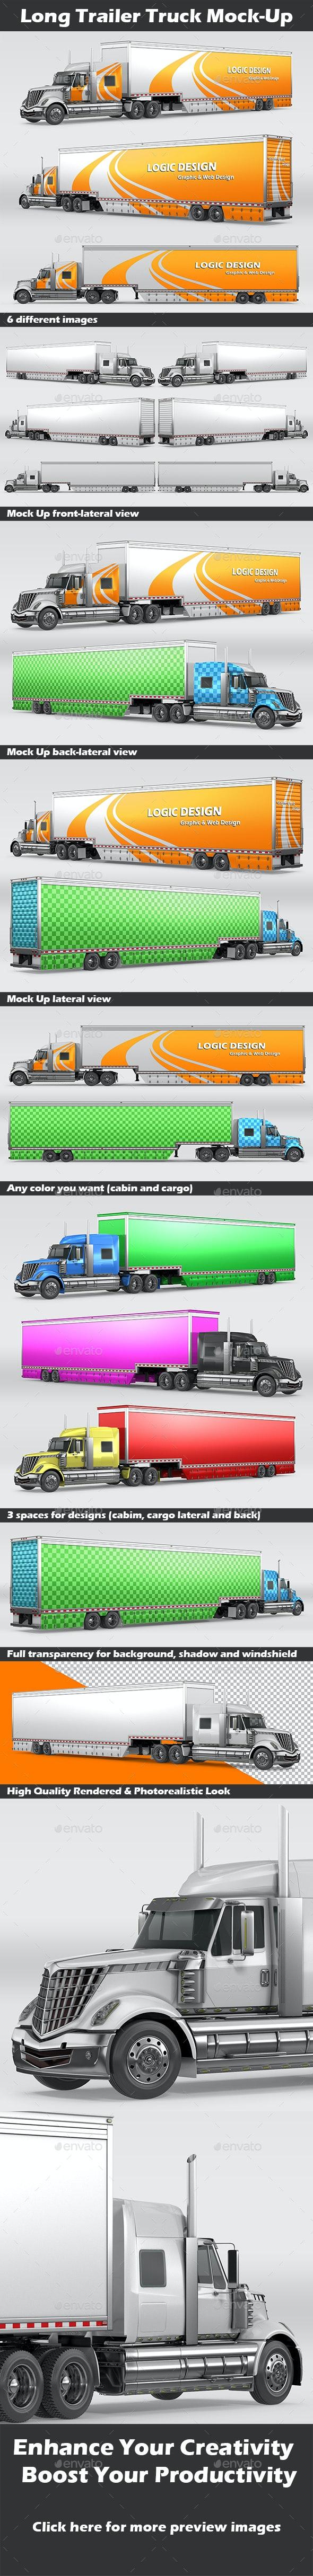 Long Trailer Truck Mock-Up - Vehicle Wraps Print